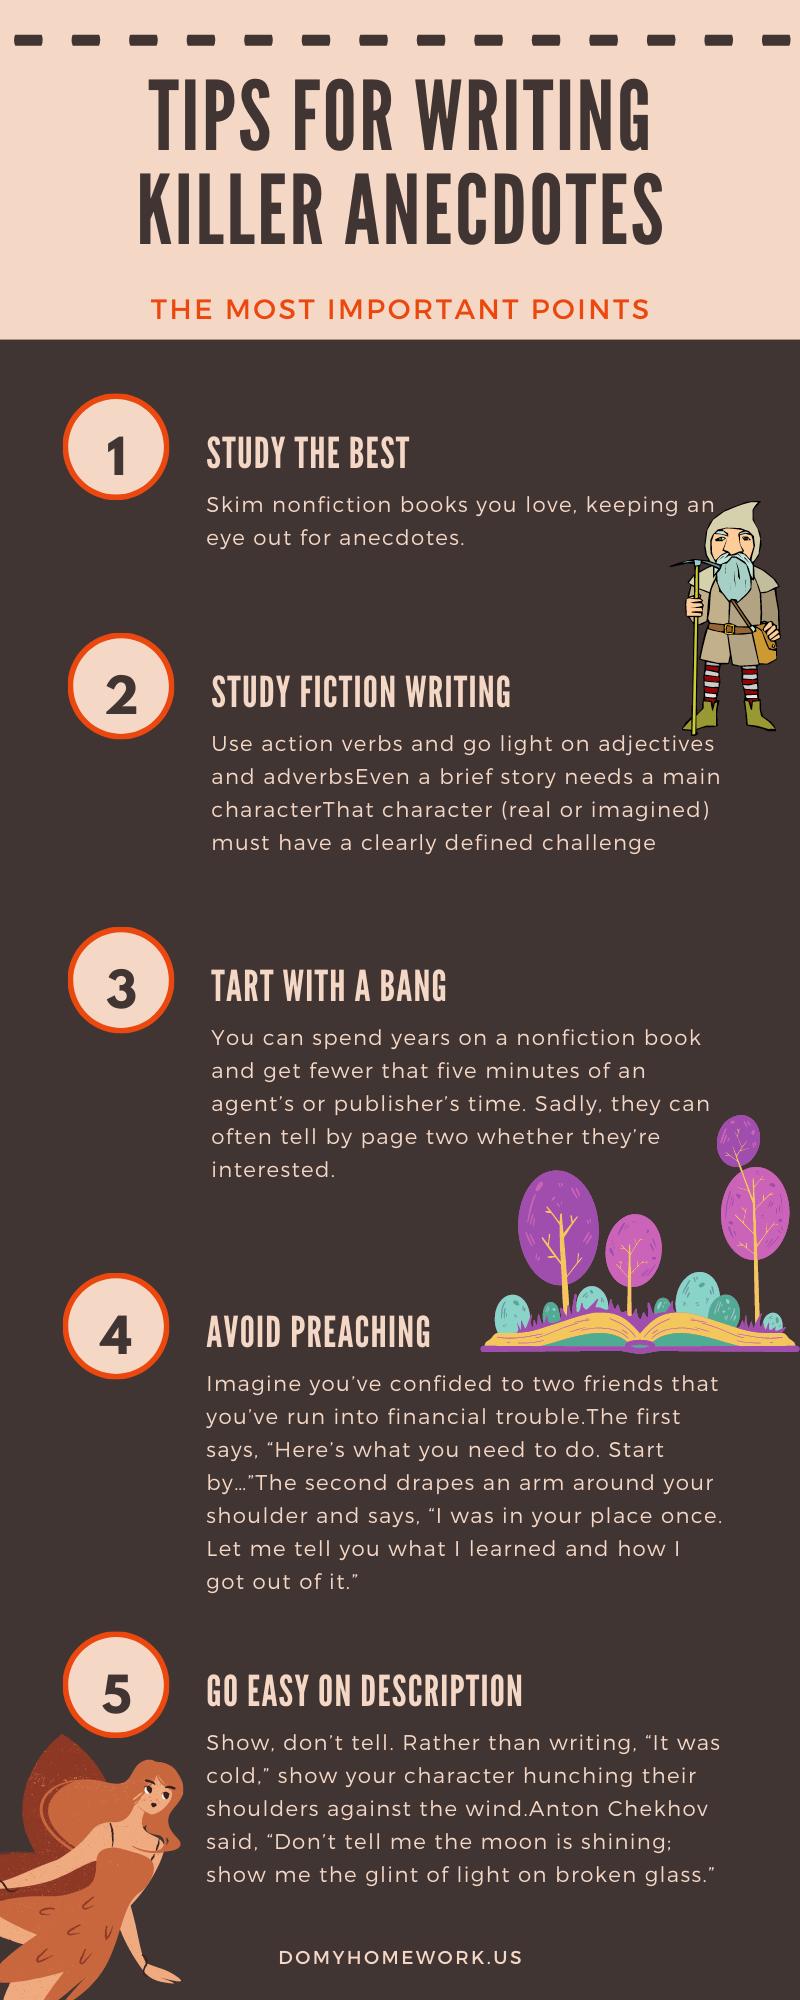 Tips-for-writing-killer-anecdotes